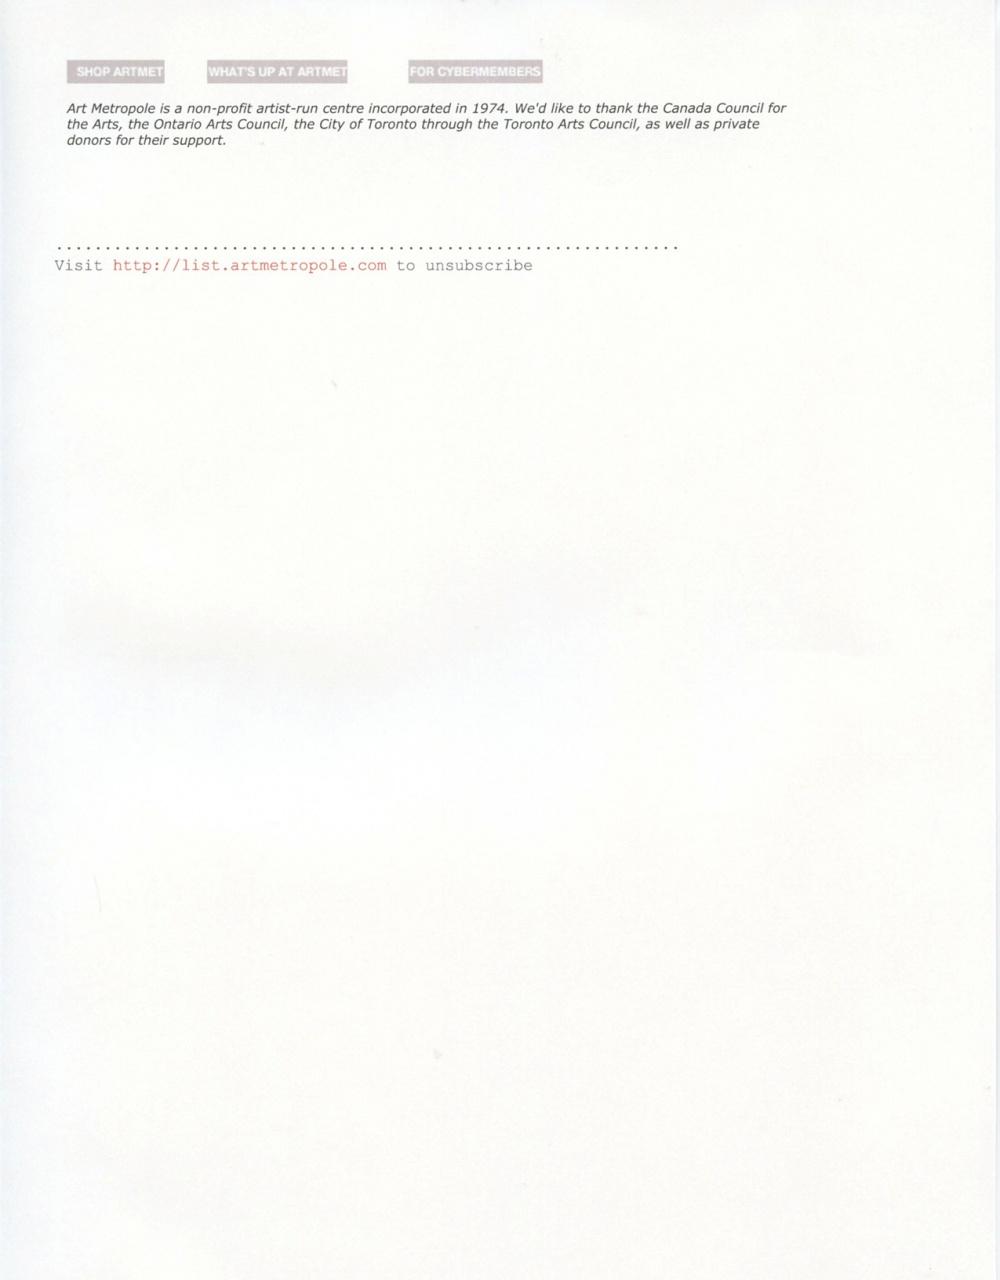 AMA0843, page 2